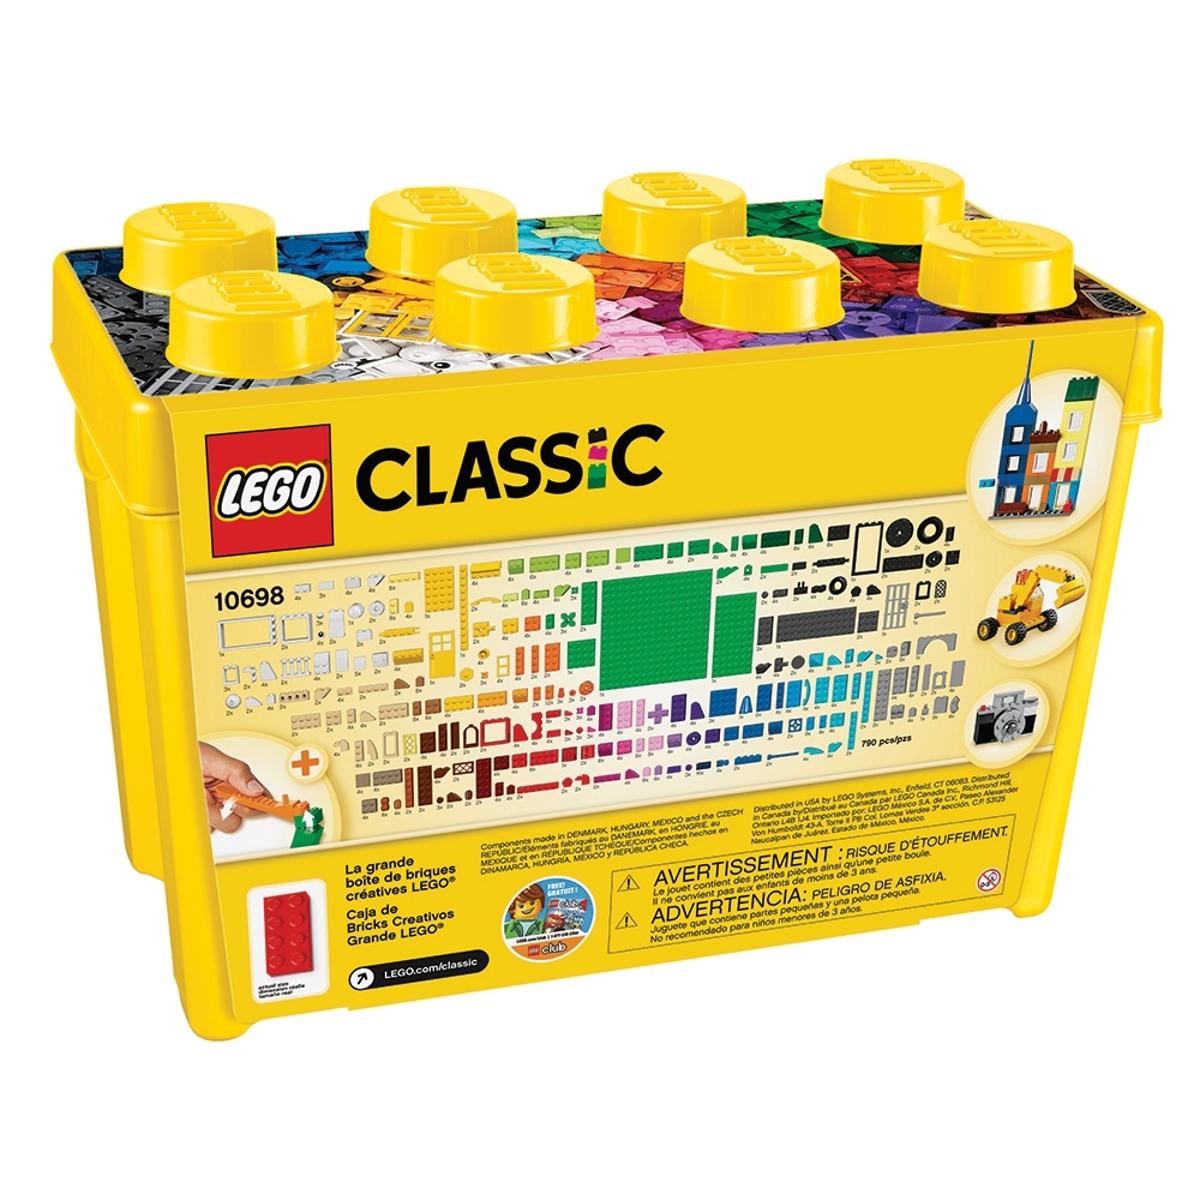 velky kreativni box lego 10698